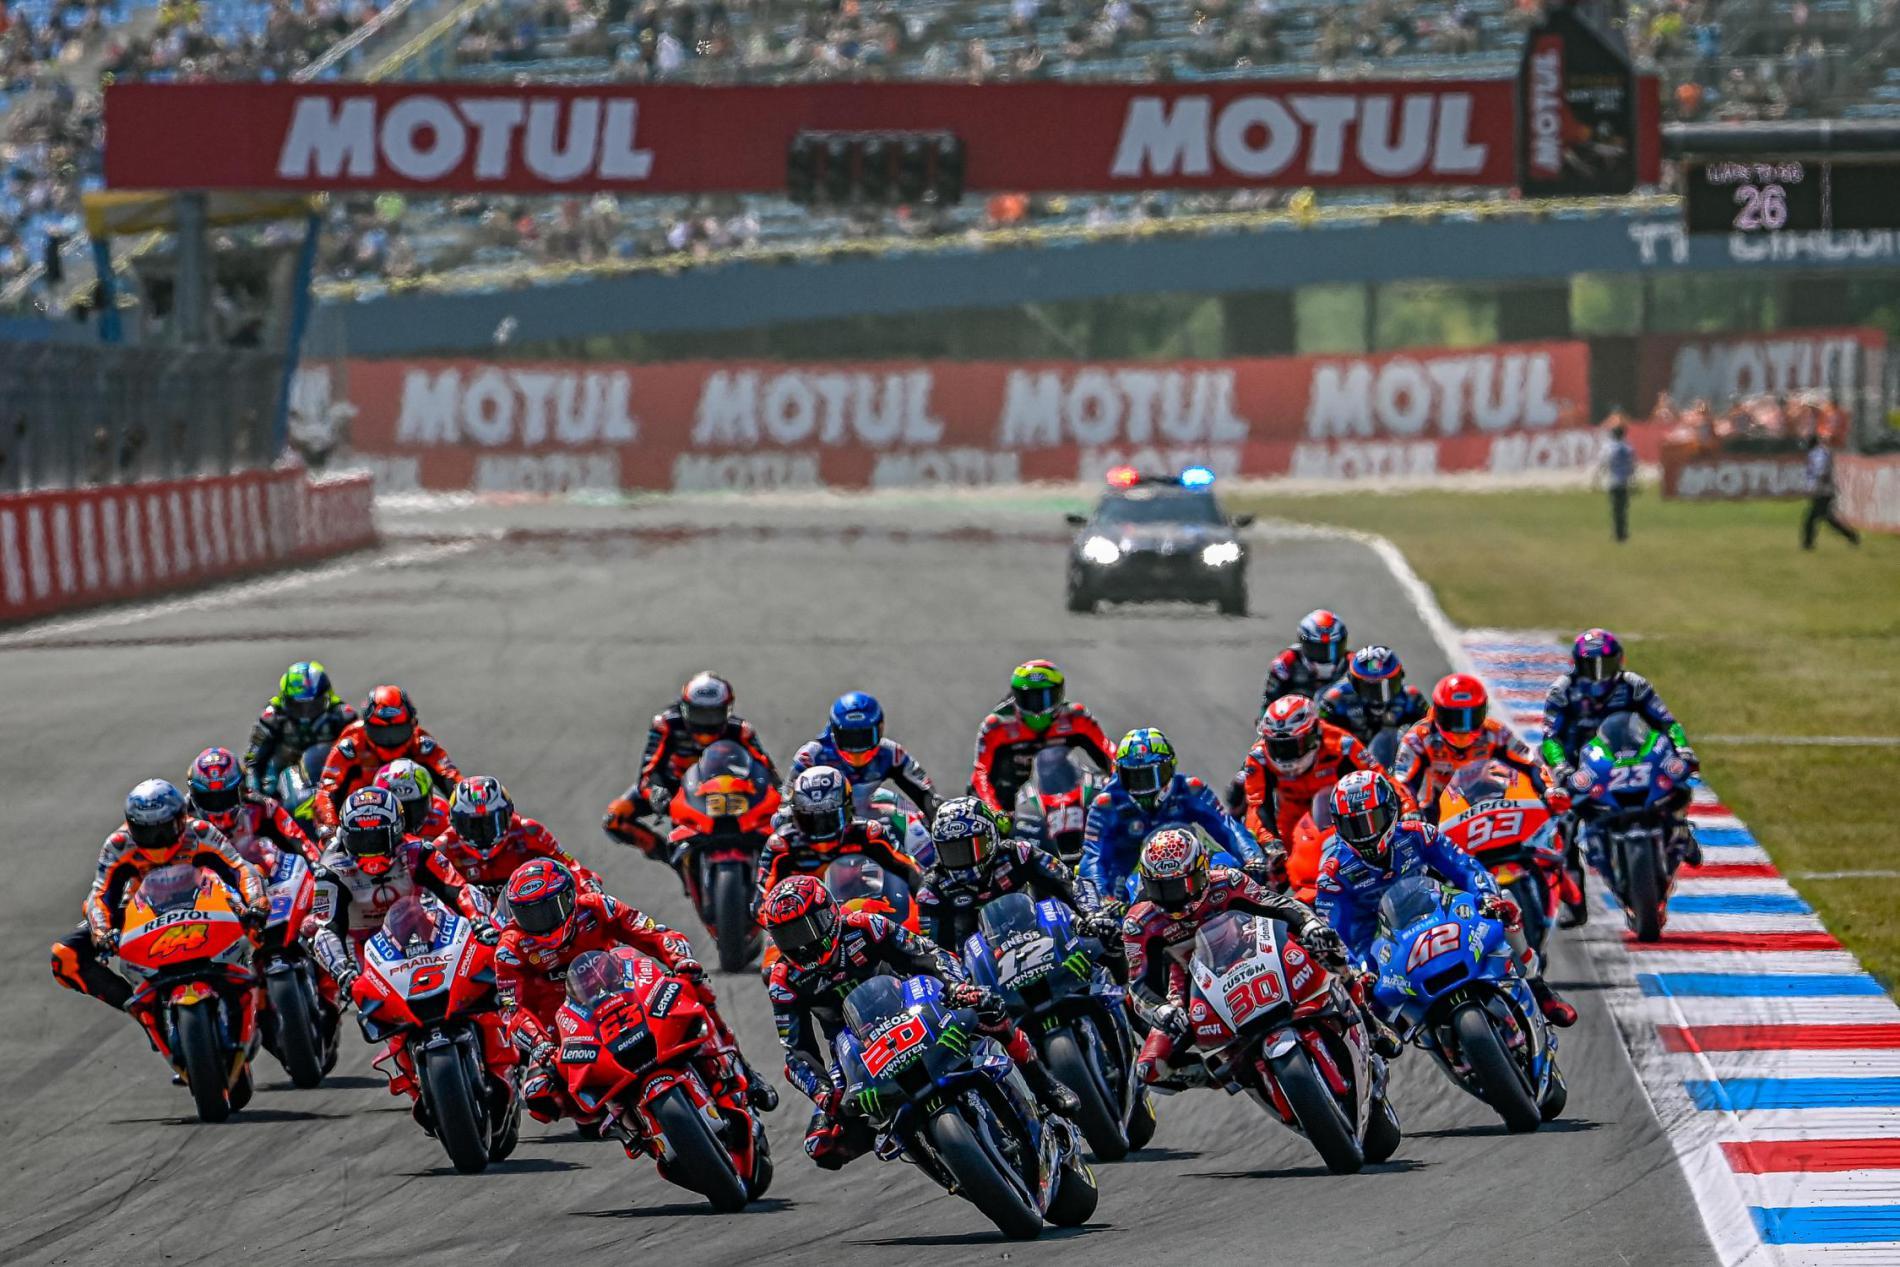 MotoGP News - Kandidat Calon Juara MotoGP 2021, Marc Marquez Termasuk?